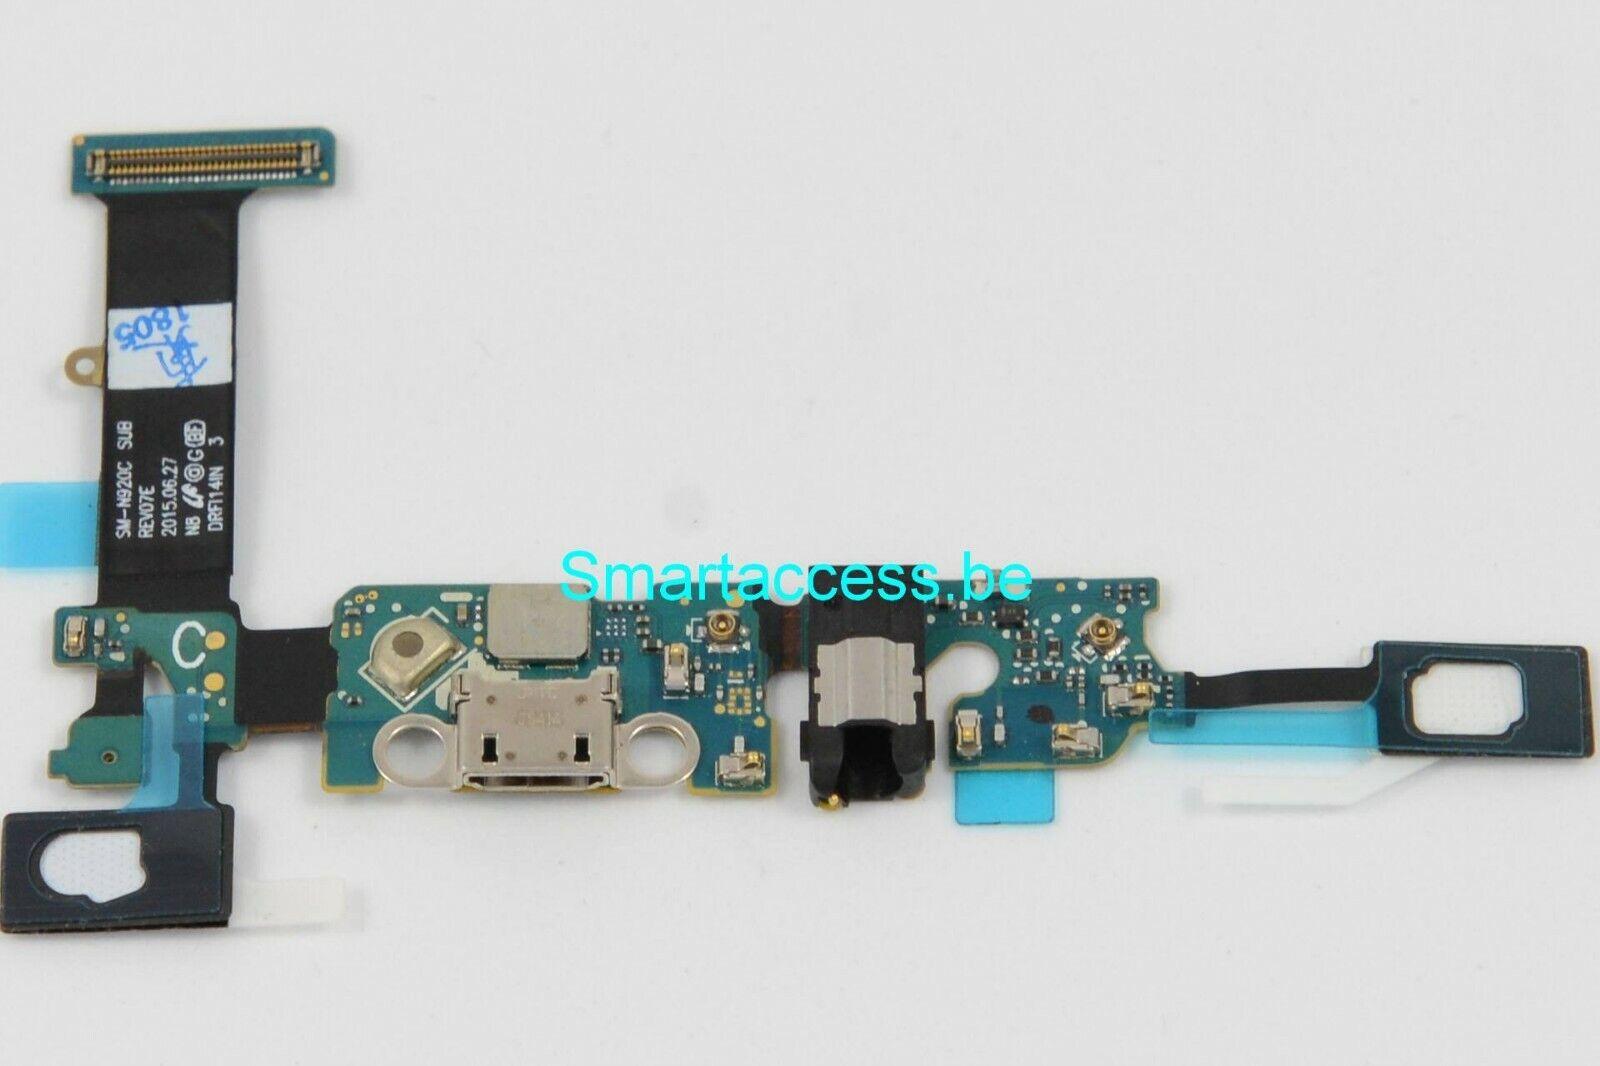 Samsung Galaxy Note 5 Dock connecteur de charge